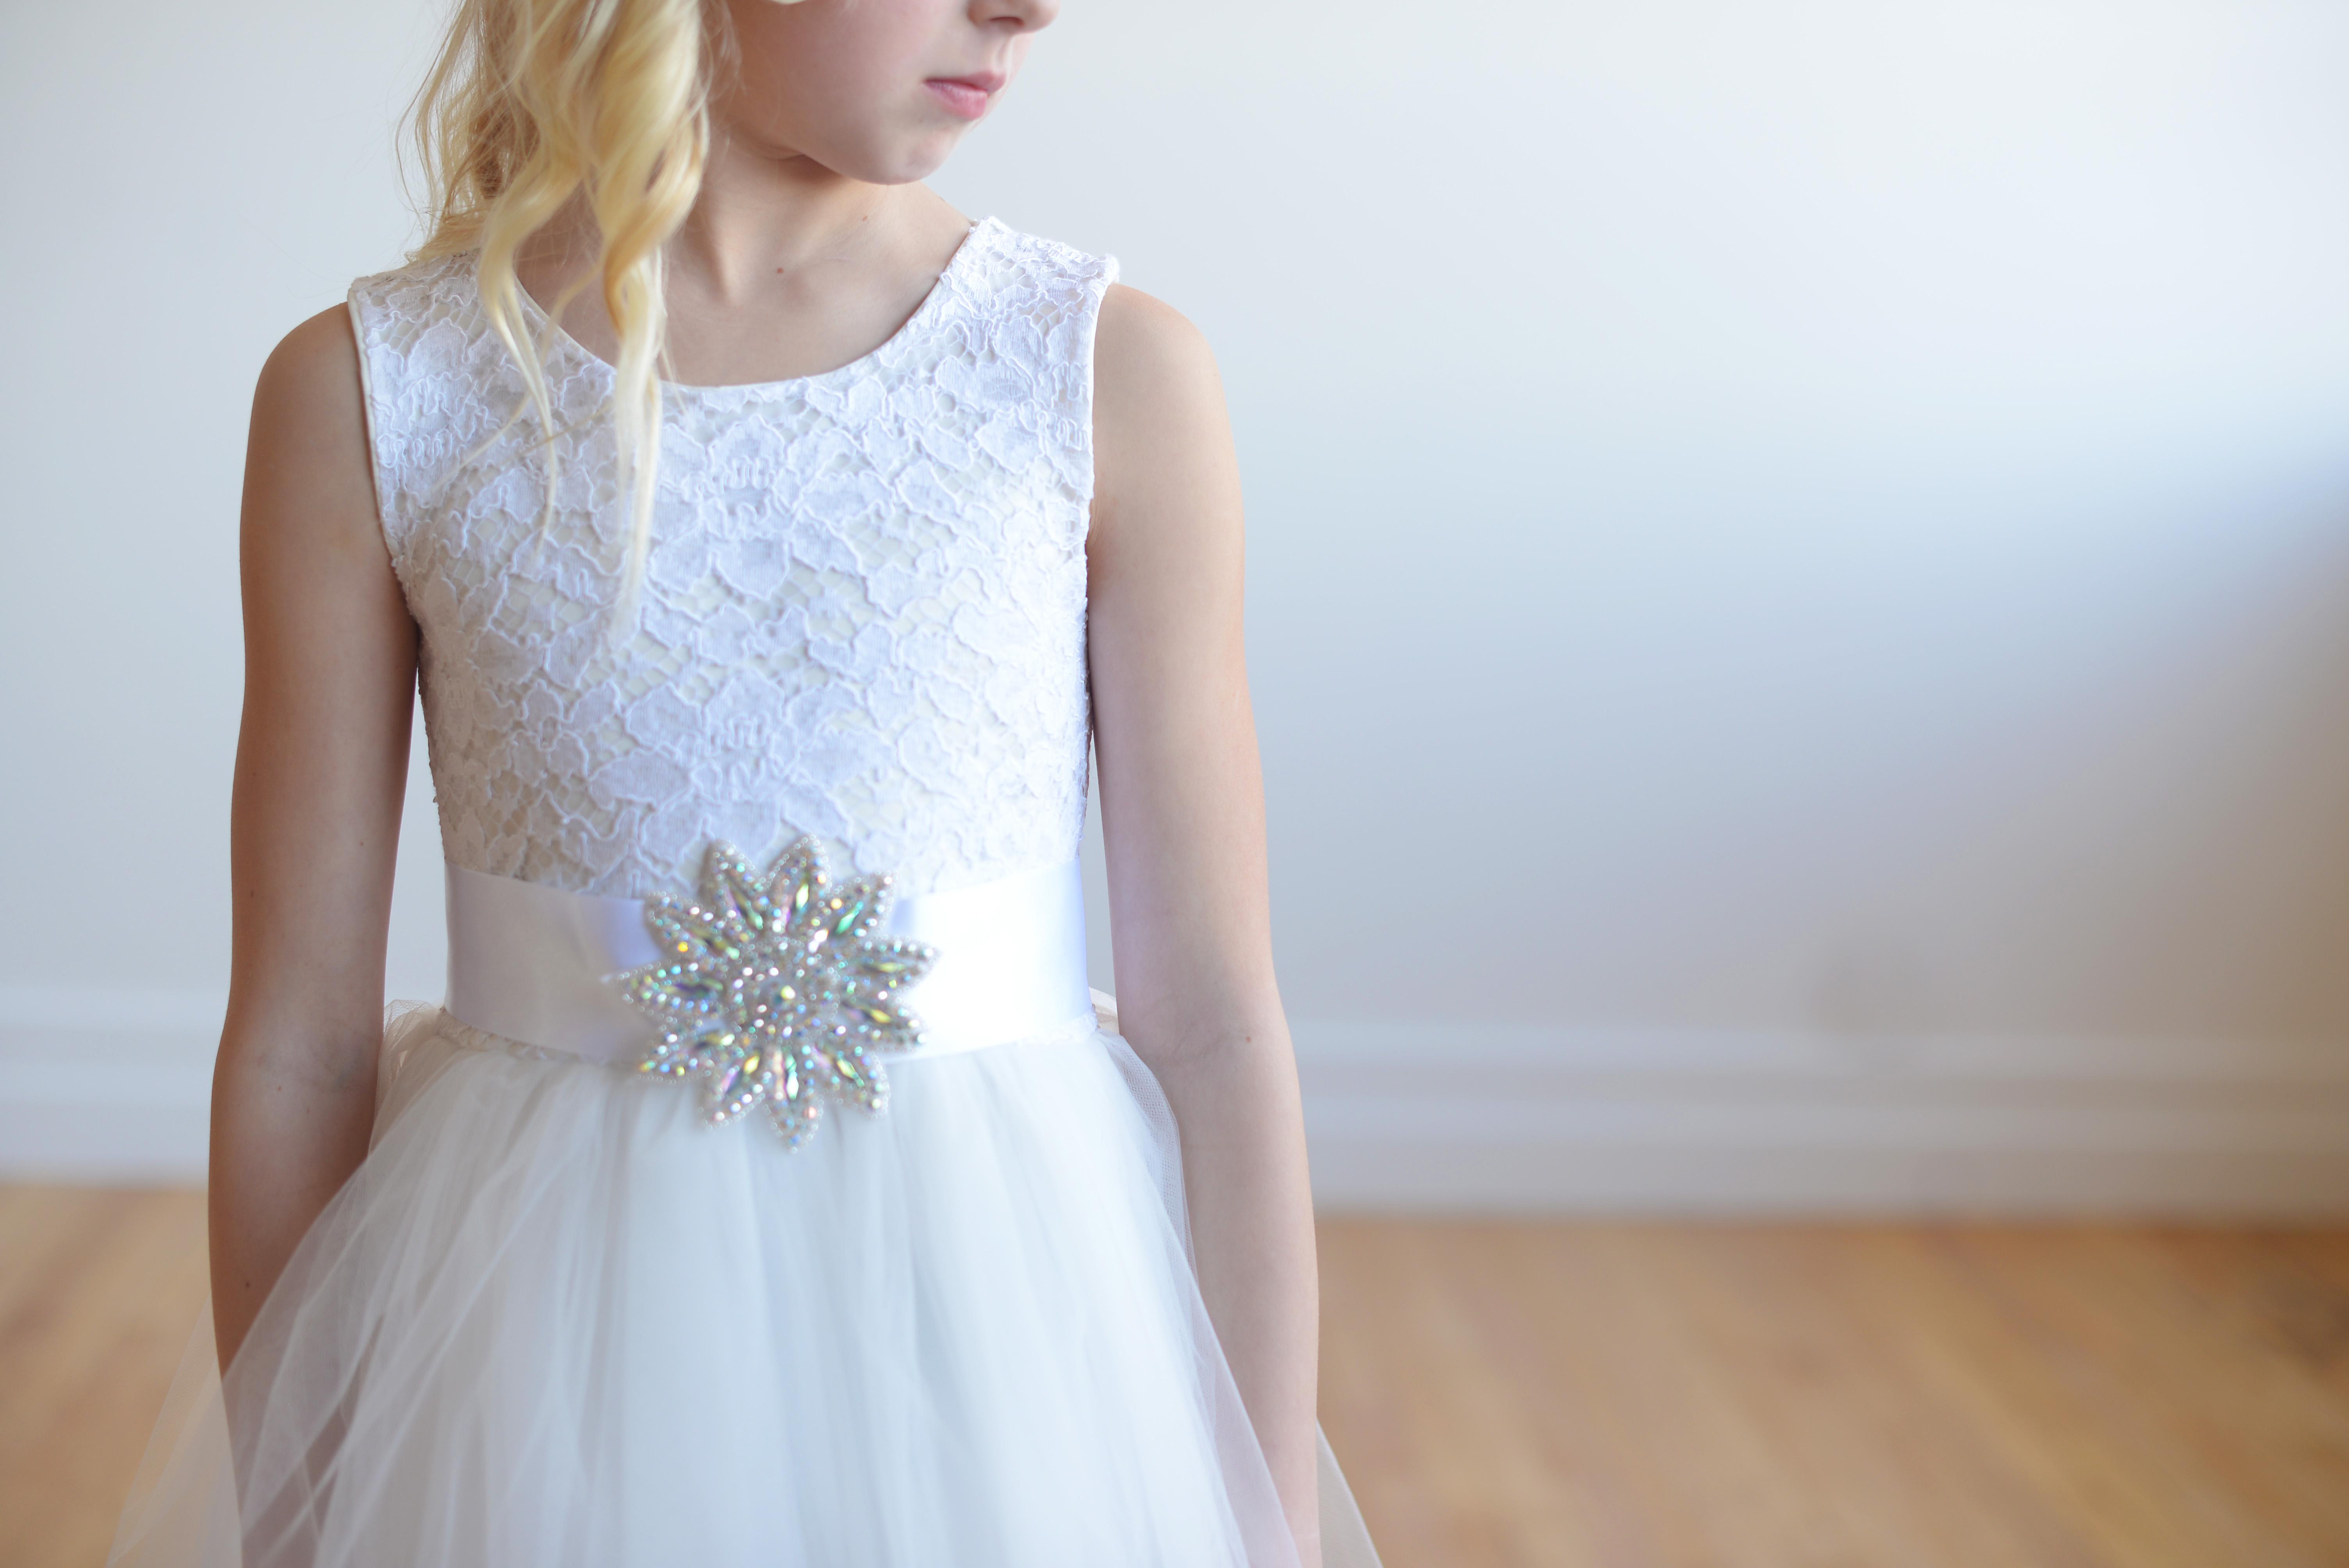 e903ed7e726 A white lace flower girl dress with full tulle skirt and diamante  embellishment on the sahsh.